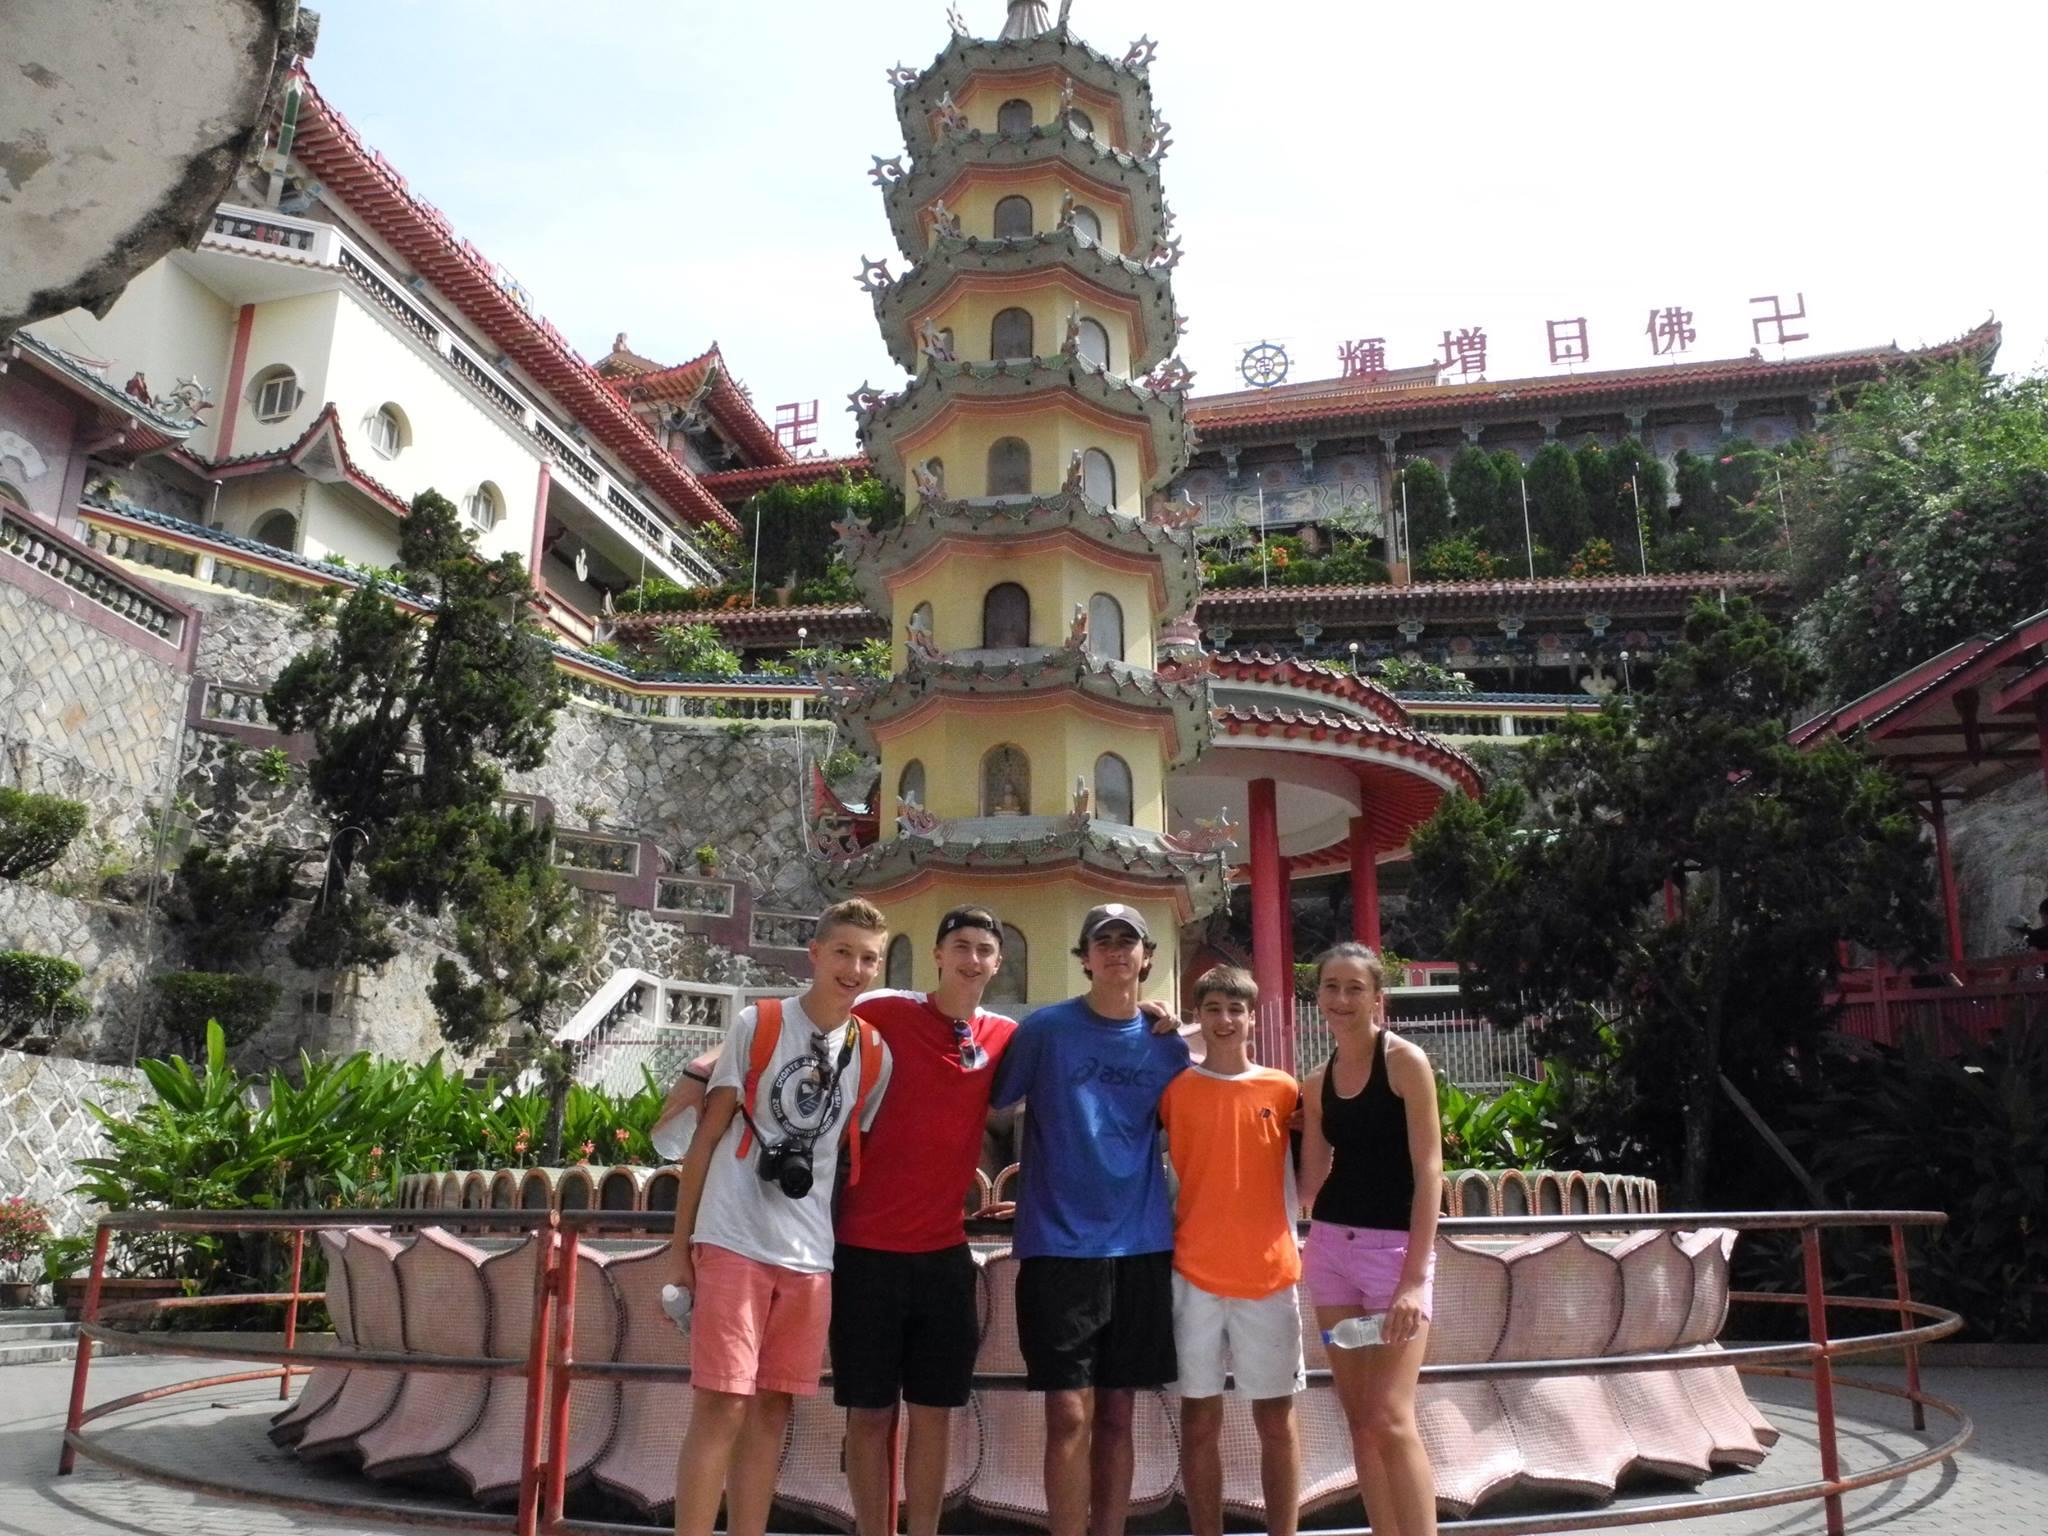 Penang - Kek lok si temple